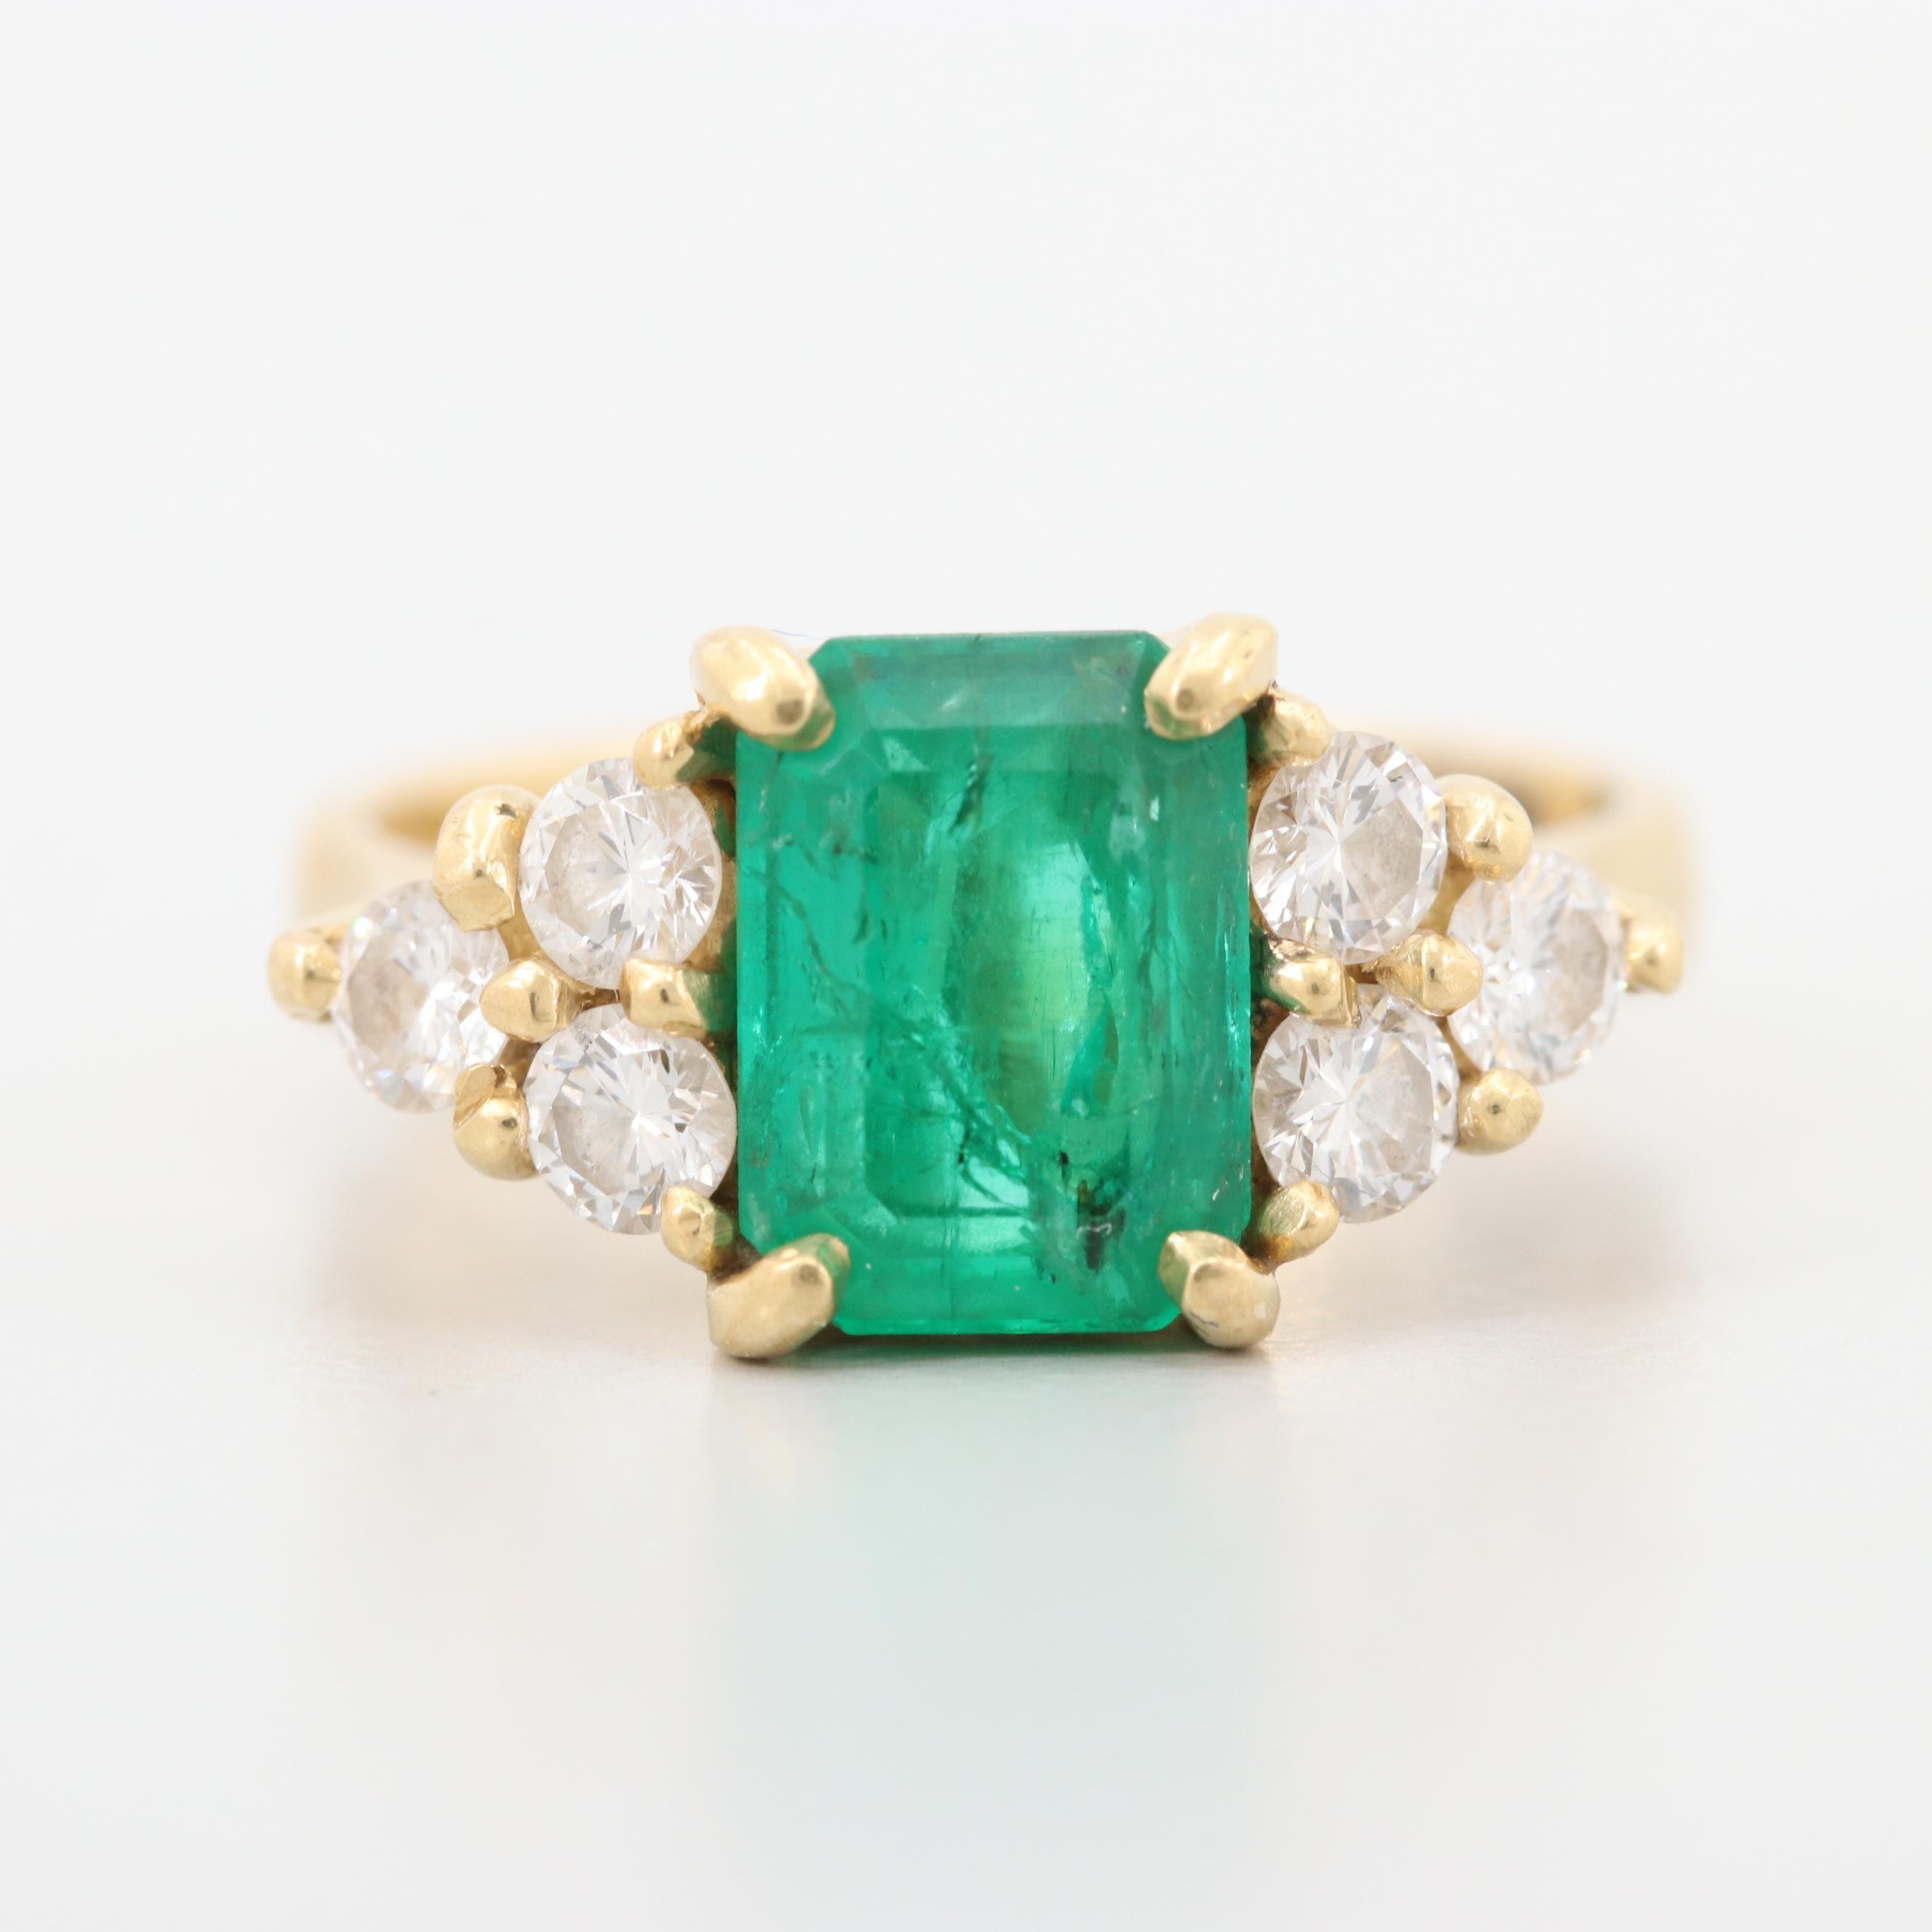 18K Yellow Gold 1.81 CT Emerald and Diamond Ring